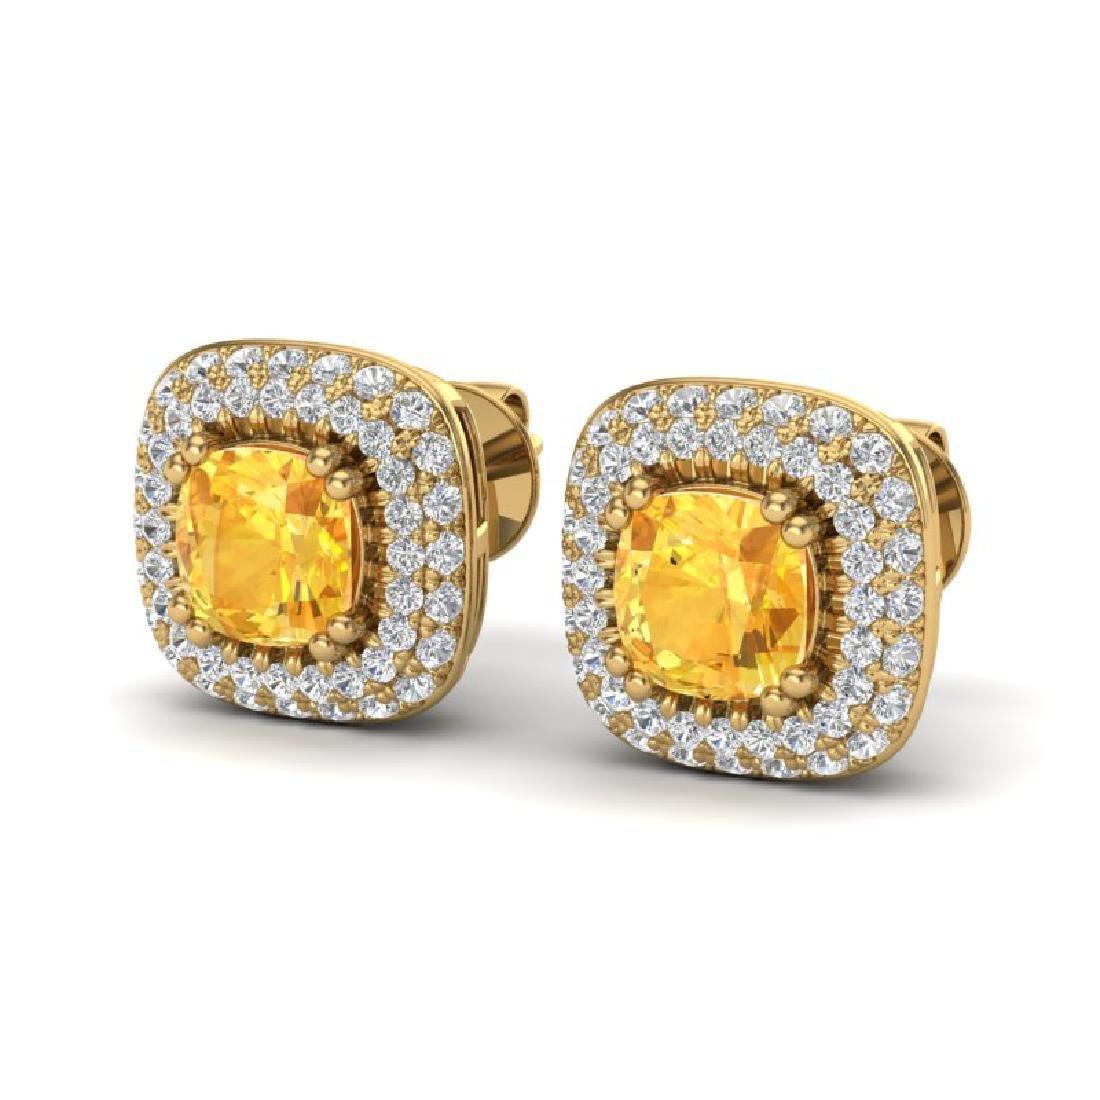 2.16 CTW Citrine & Micro VS/SI Diamond Earrings Halo